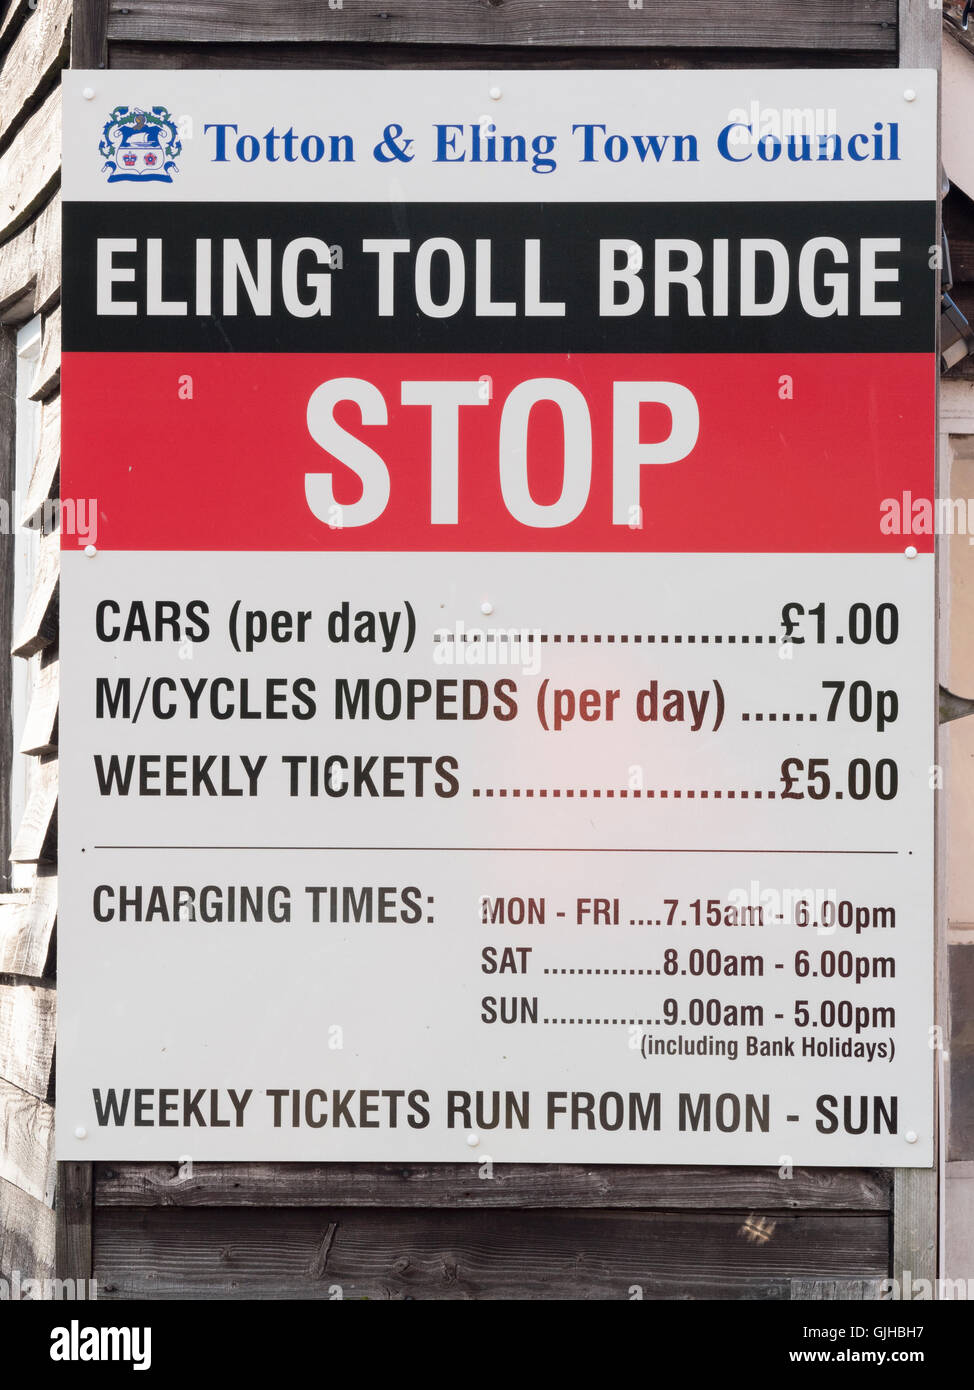 Eling toll bridge car park